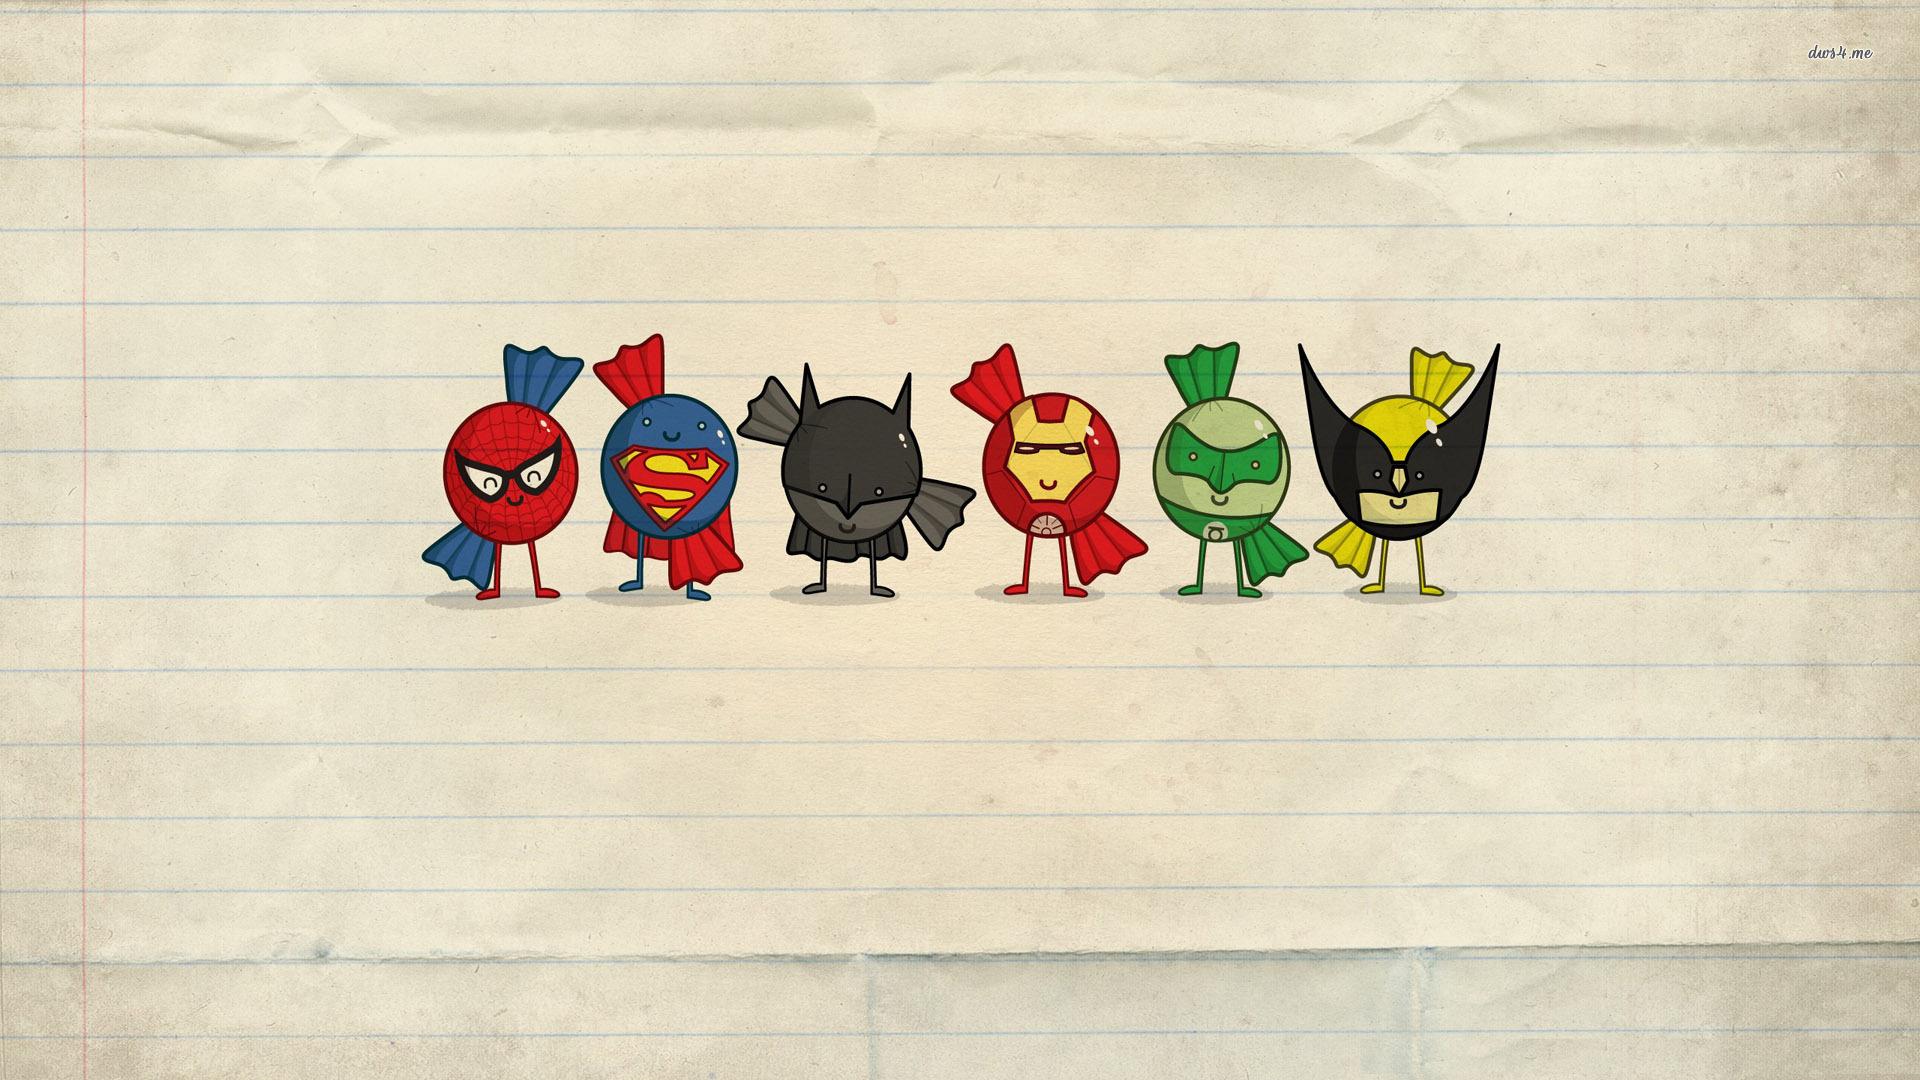 Superhero Logos Wallpaper Superhero candy hd wallpaper 1920x1080